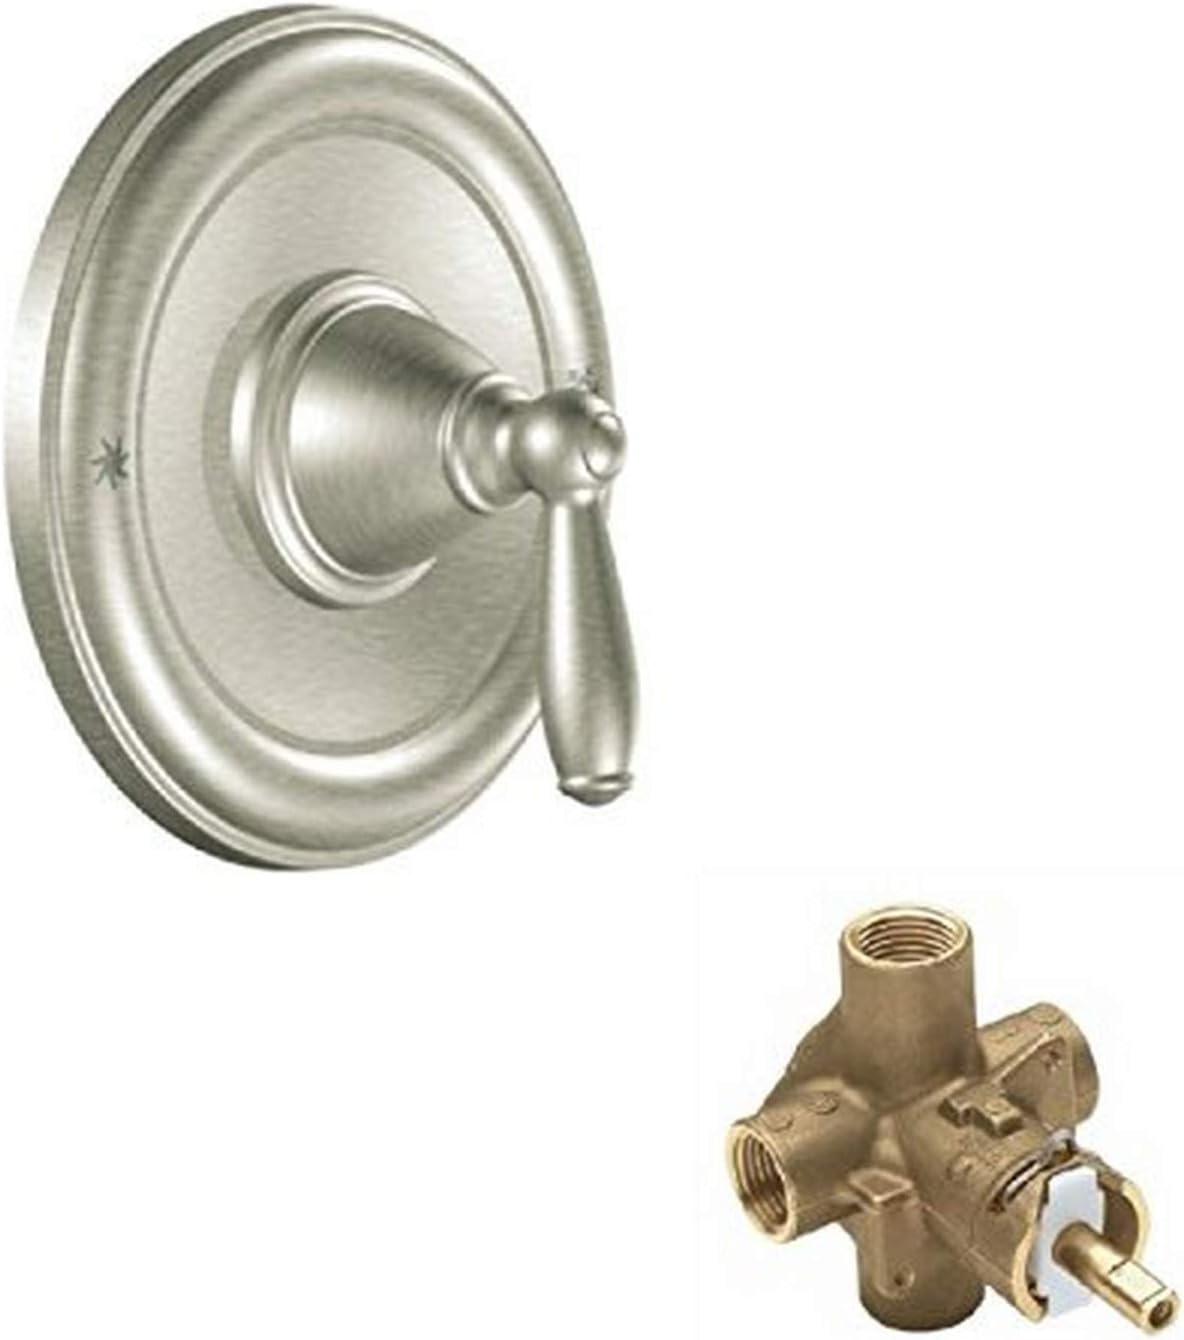 Moen KSVBR-P-T2151BN-2 Brantford Shower Valve Brushed Nickel